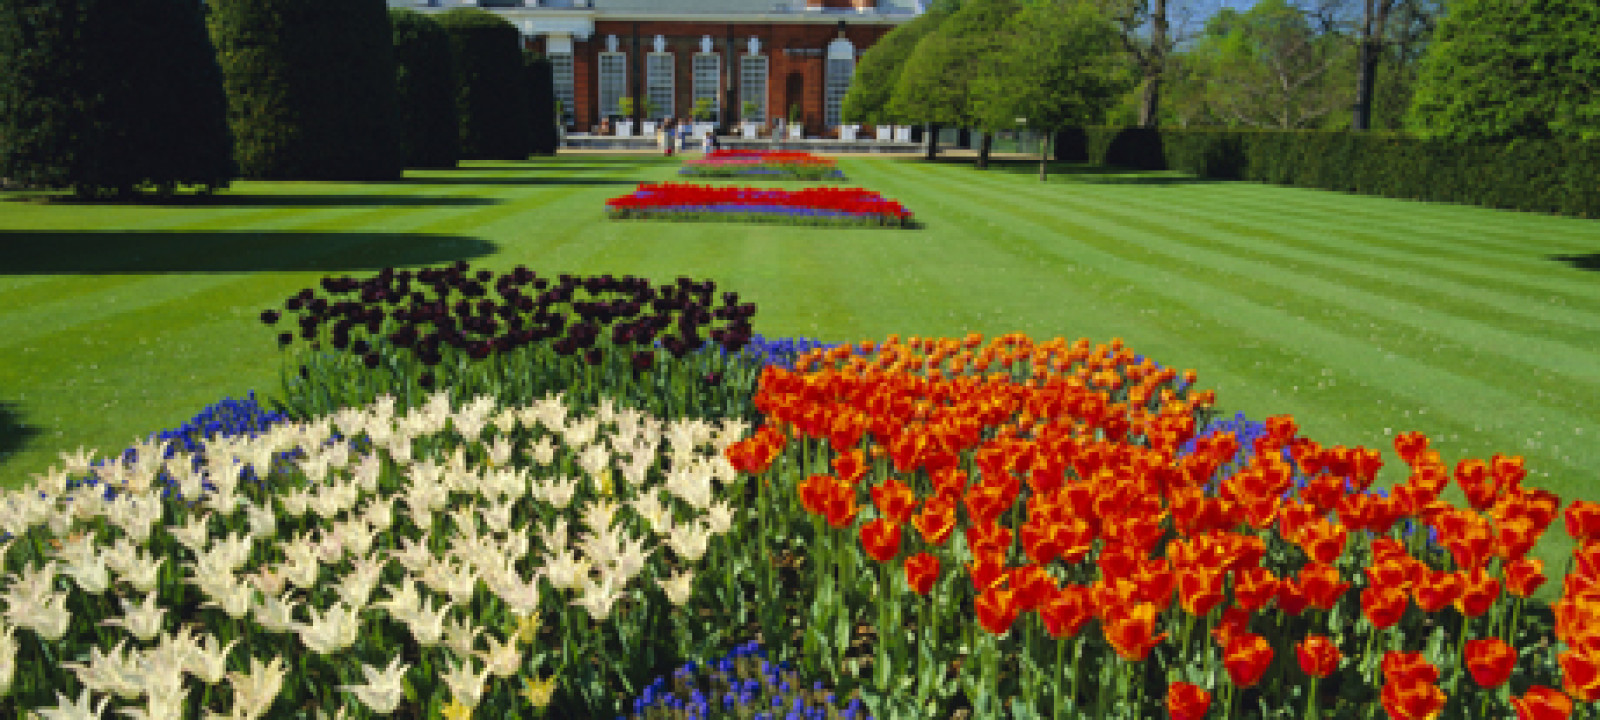 Tulips and the Orangery, Kensington Palace, Kensington Gardens,